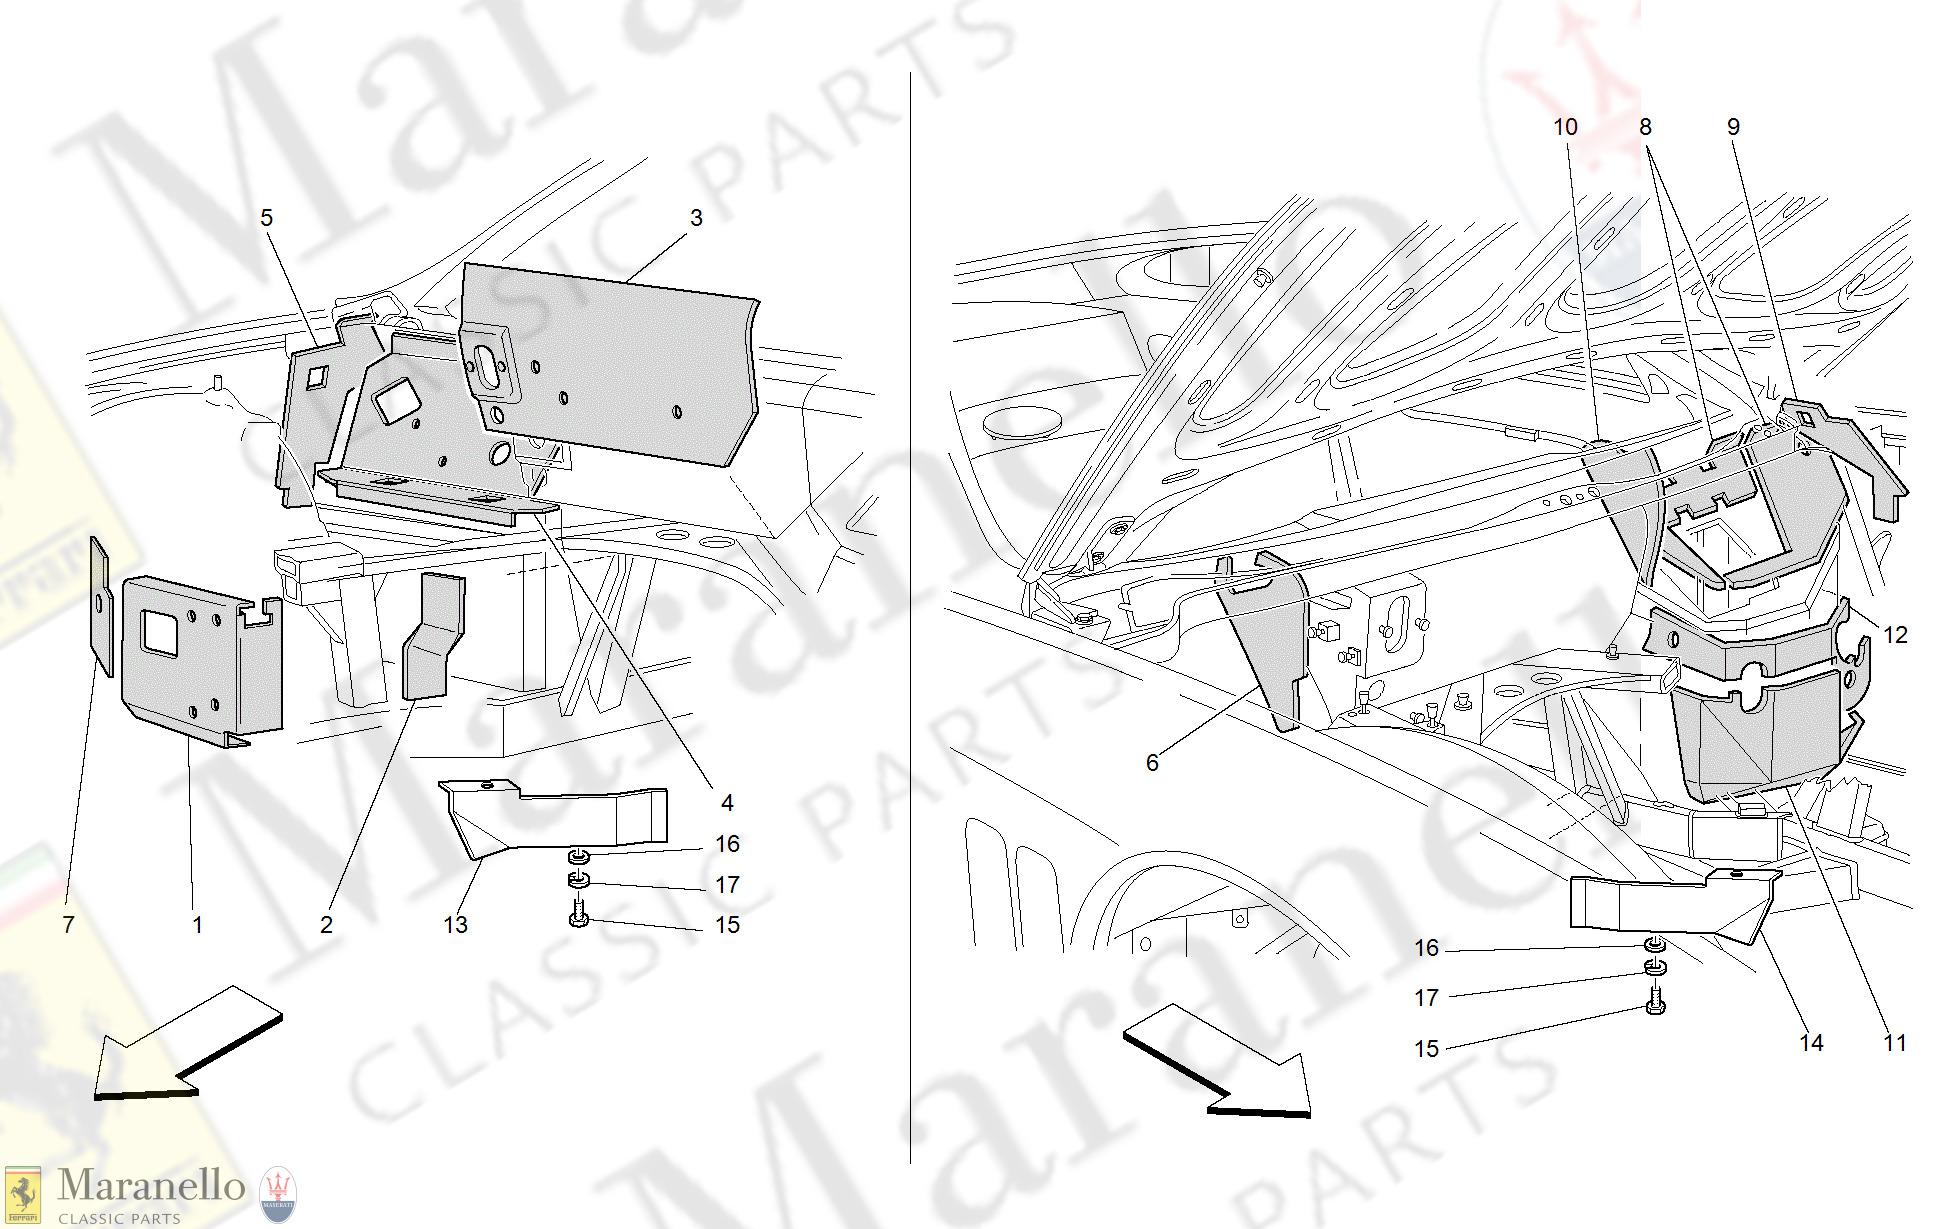 rx8 engine bay diagram rx8 engine bay layout e24 wiring diagram  rx8 engine bay layout e24 wiring diagram